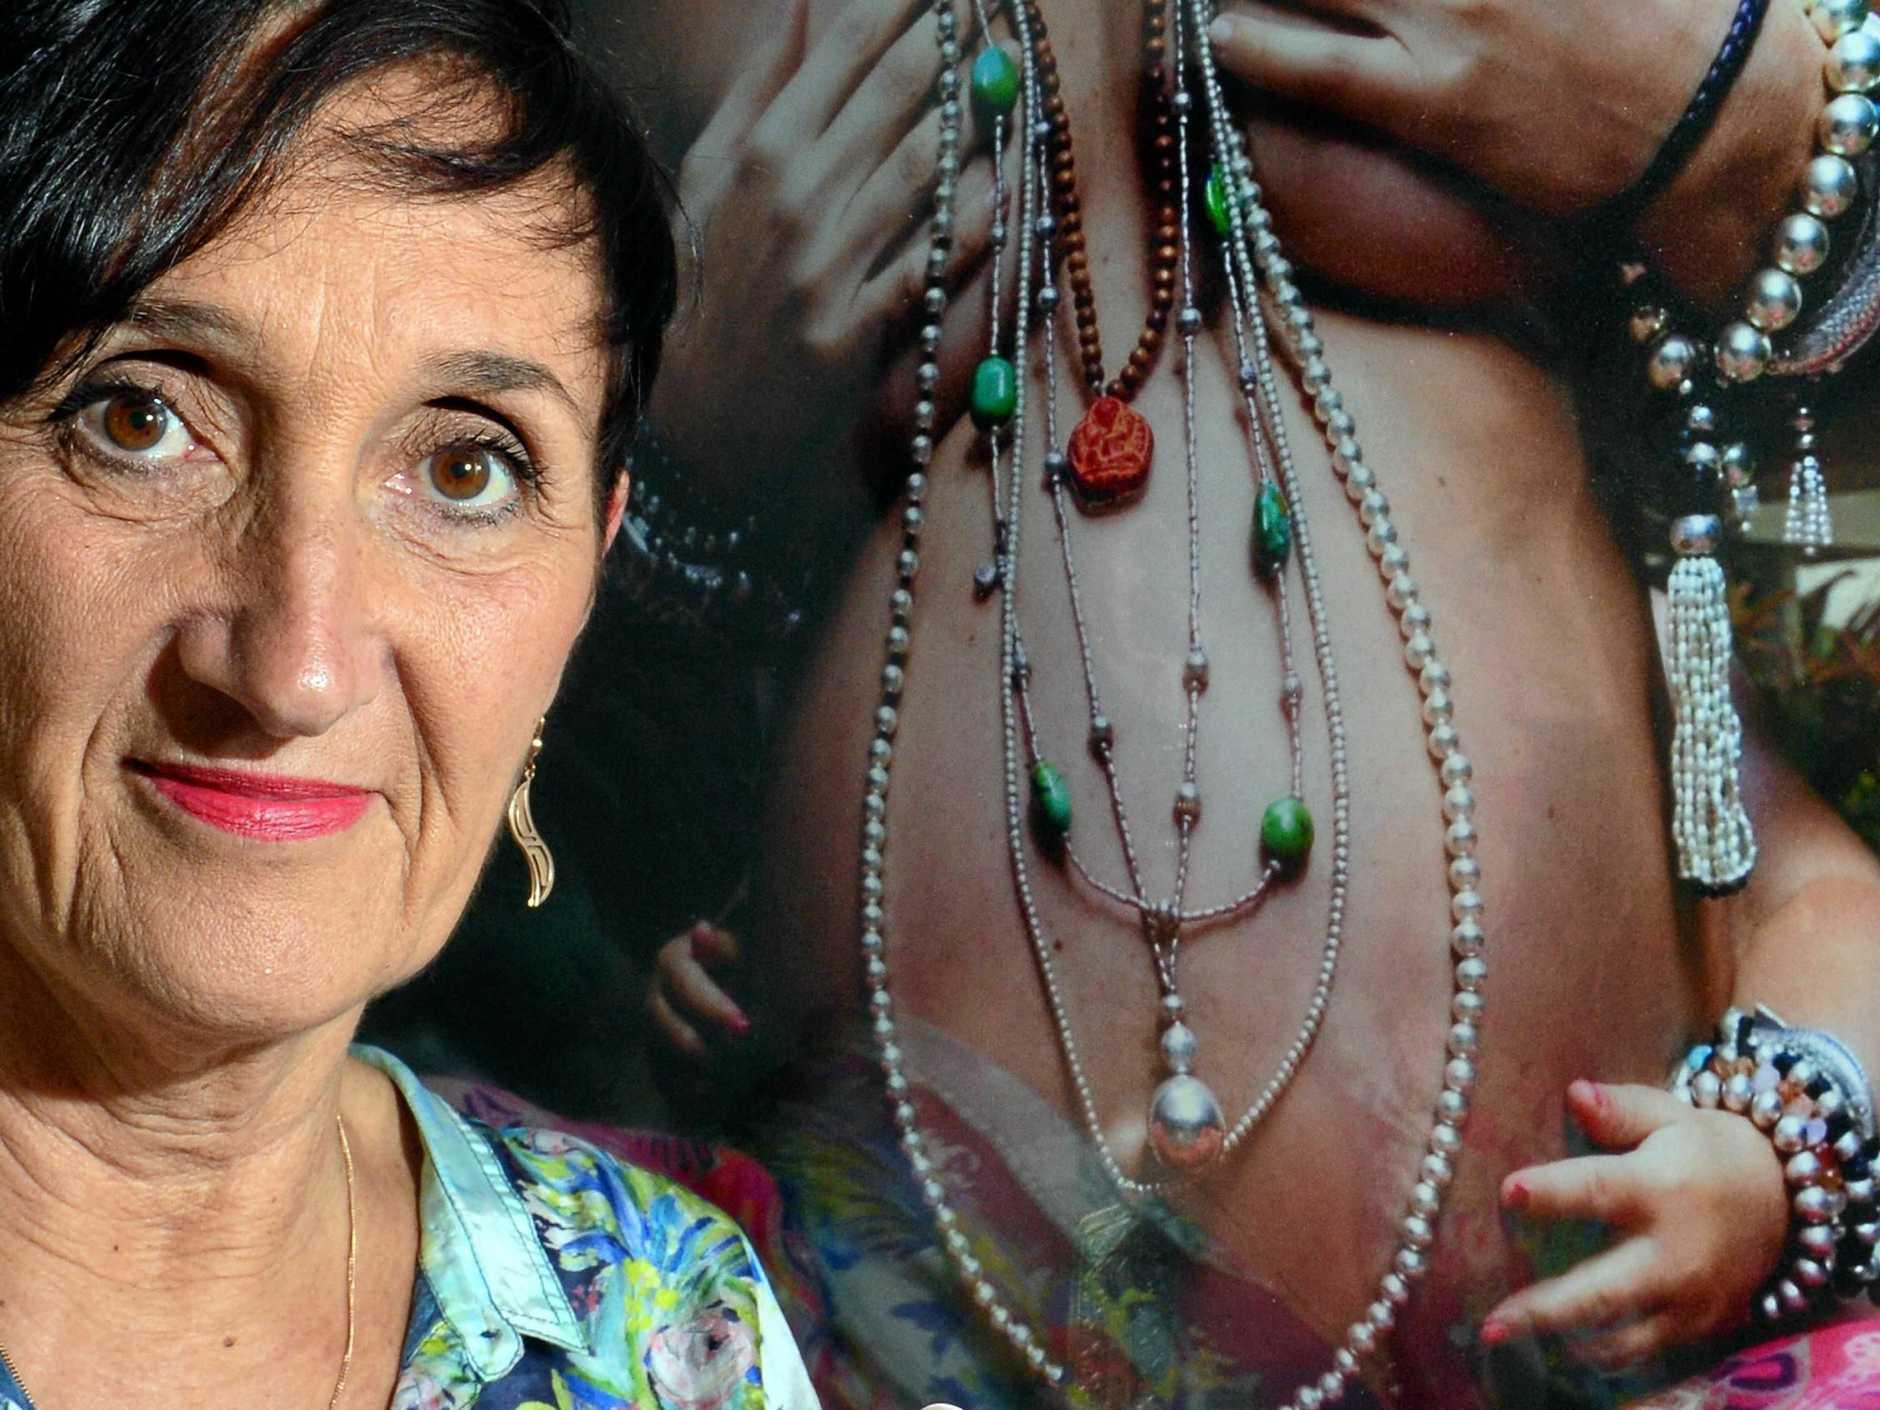 Midwife Mary Ziegler facilitates homebirths on the Sunshine Coast.